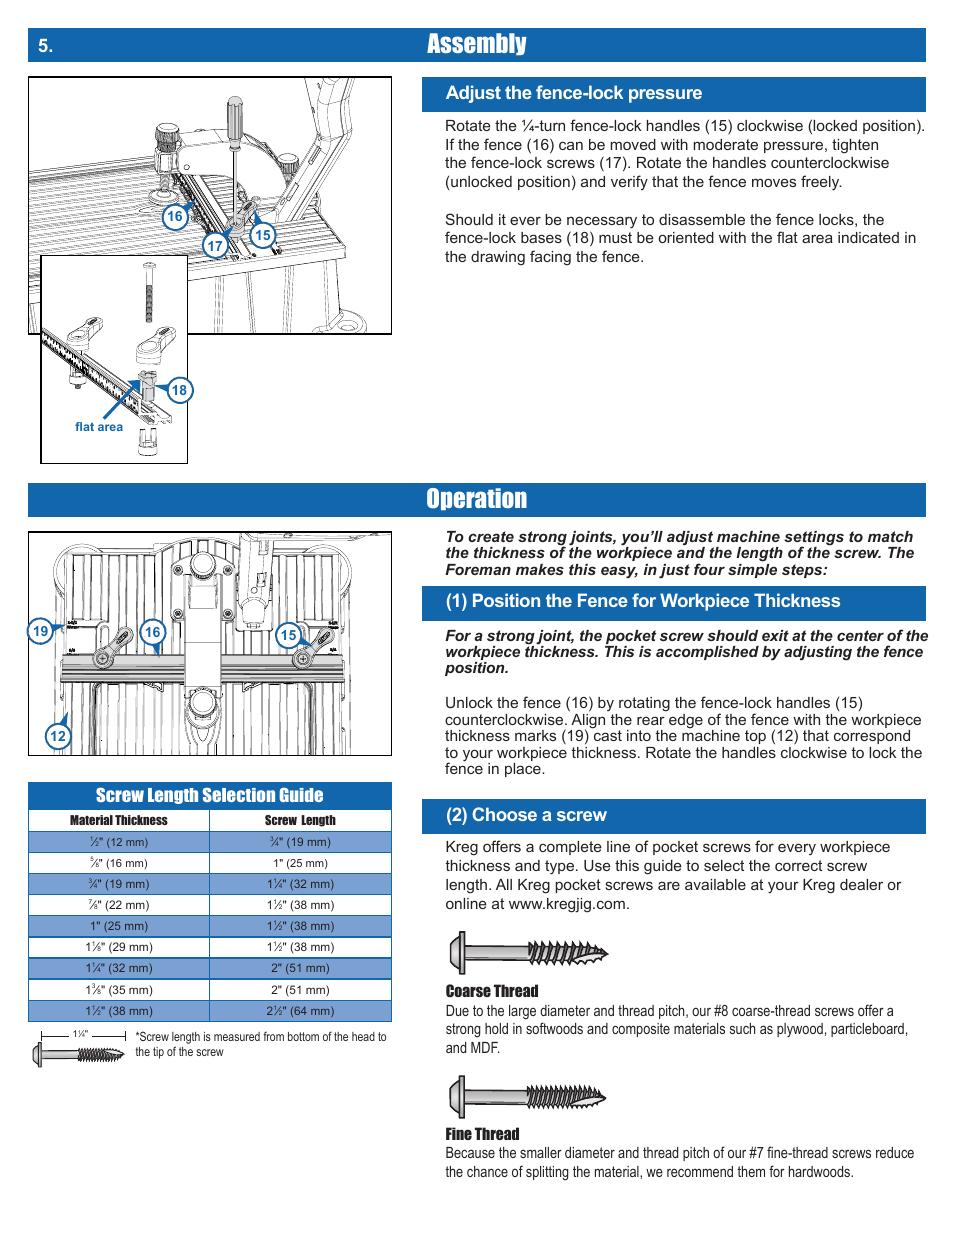 Assembly, Operation, Adjust the fence-lock pressure | Kreg DB210